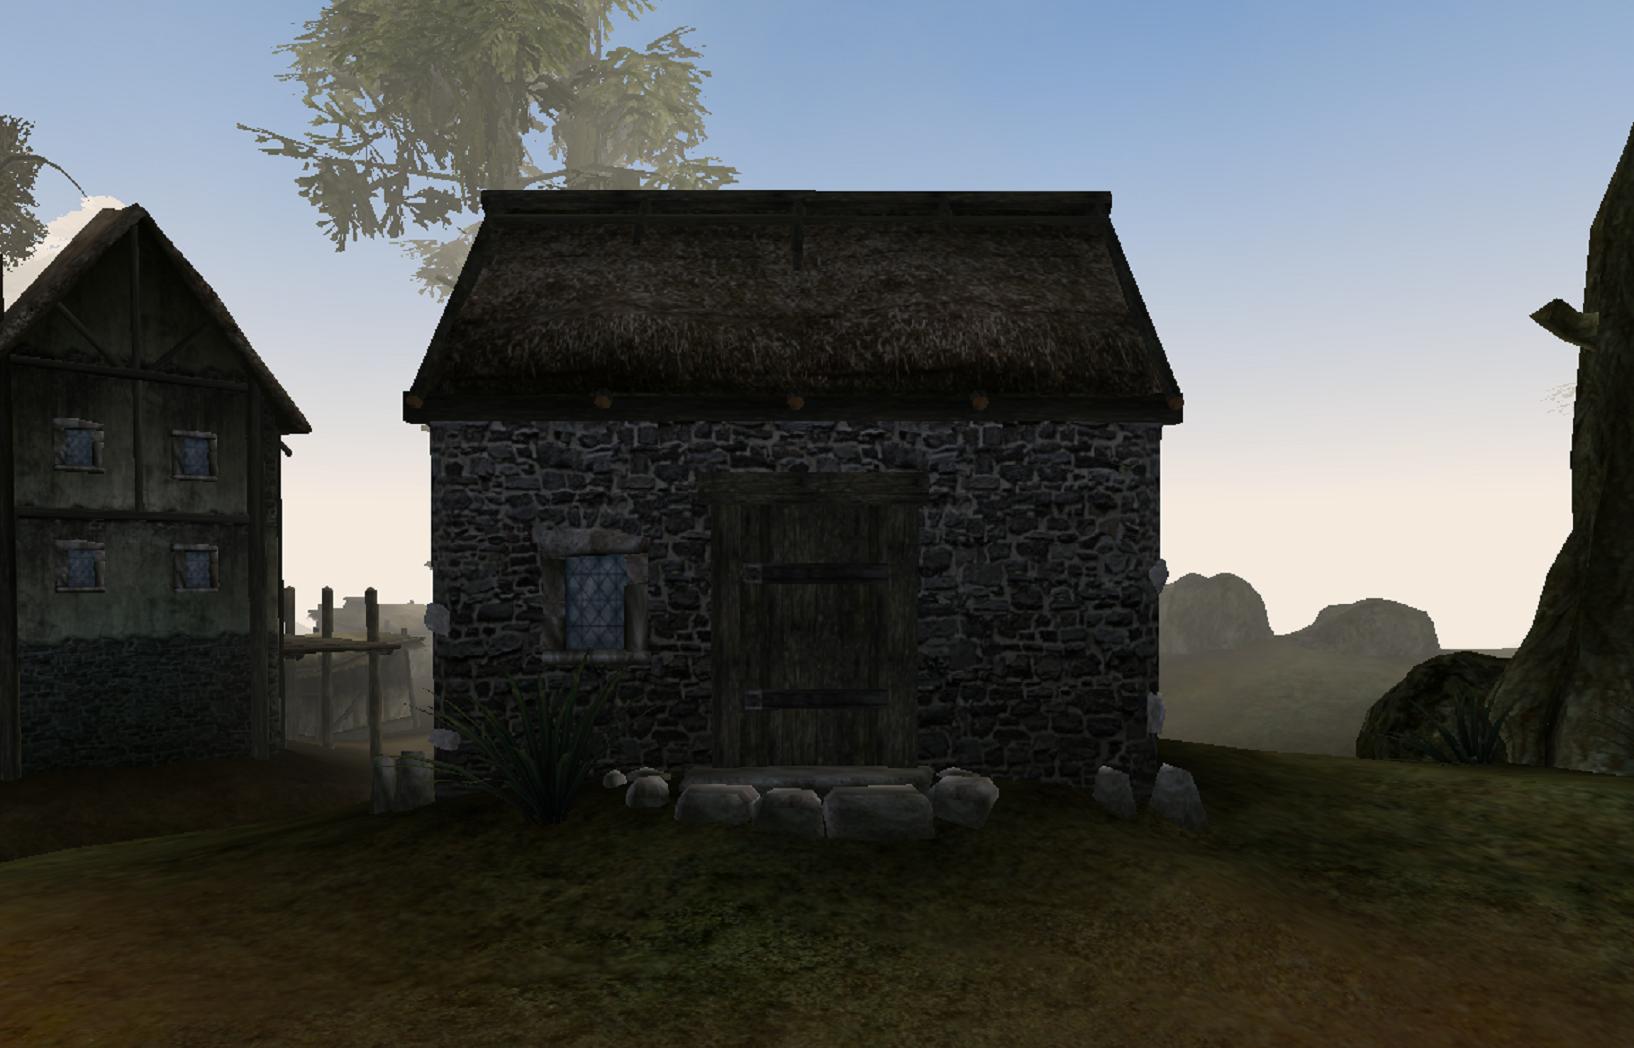 Fargoth's House